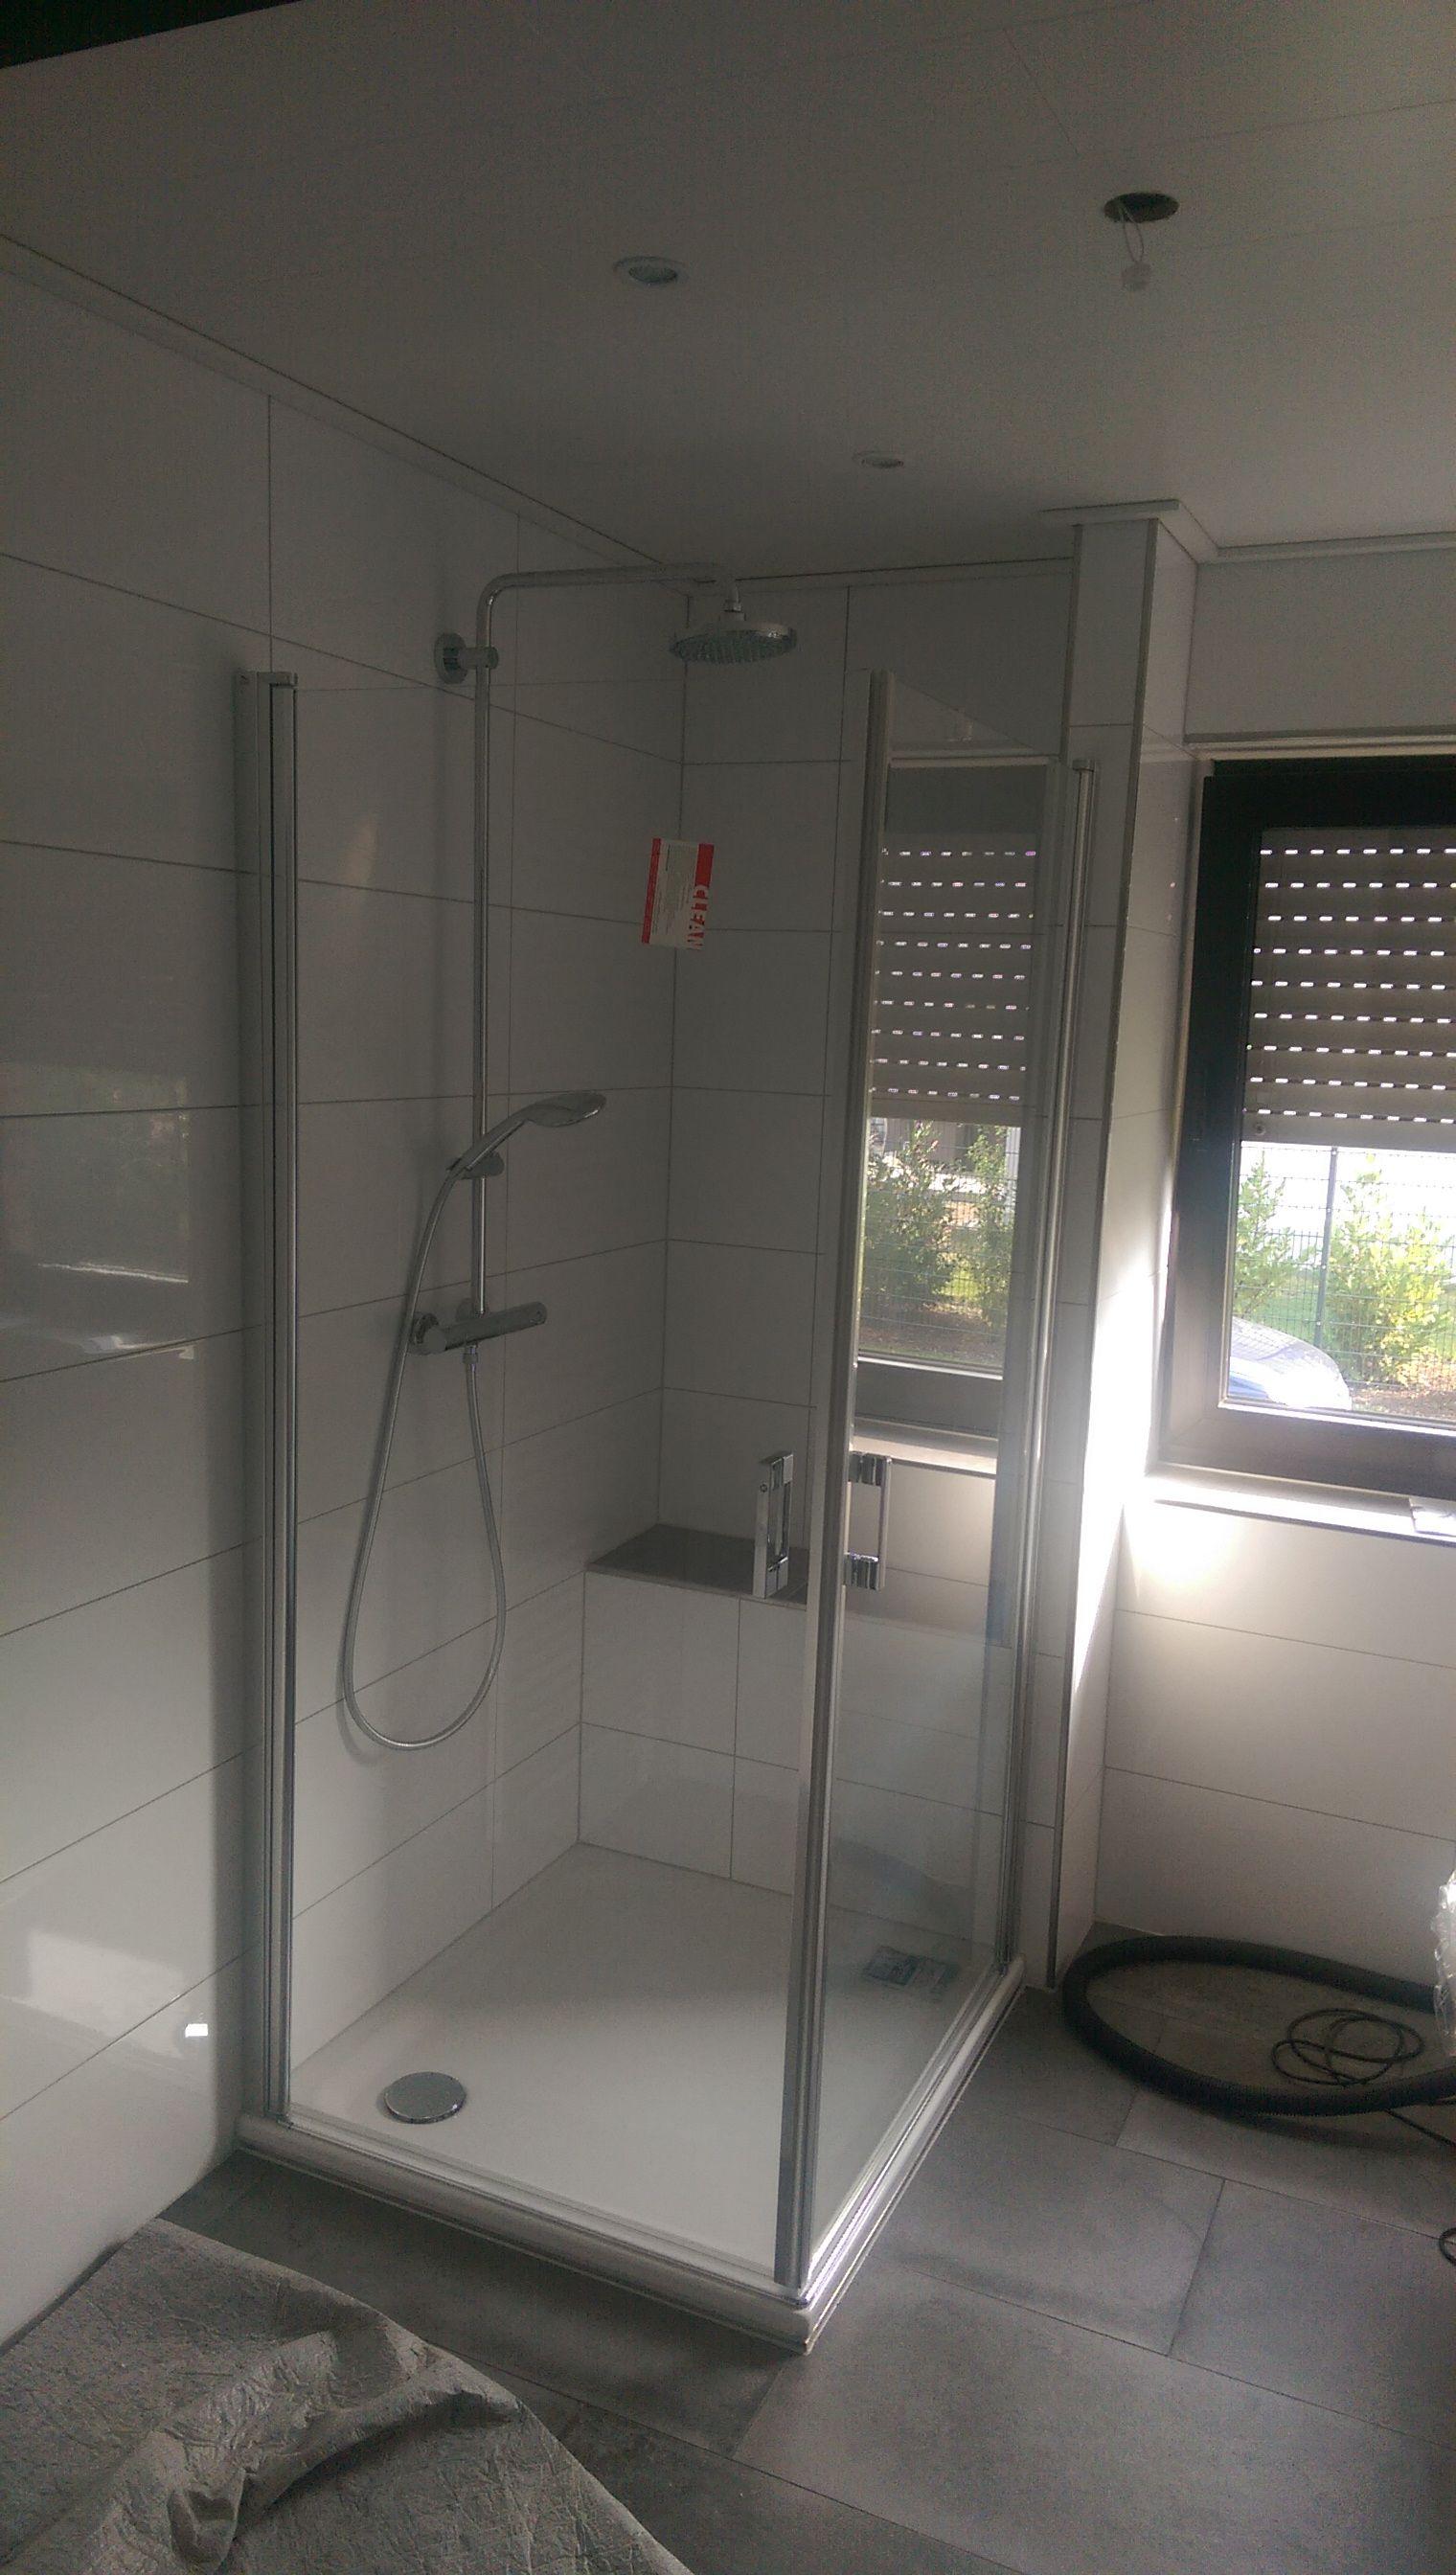 Kermi Eckdusche Badezimmer Mit Eckdusche Eckduschen Dusche